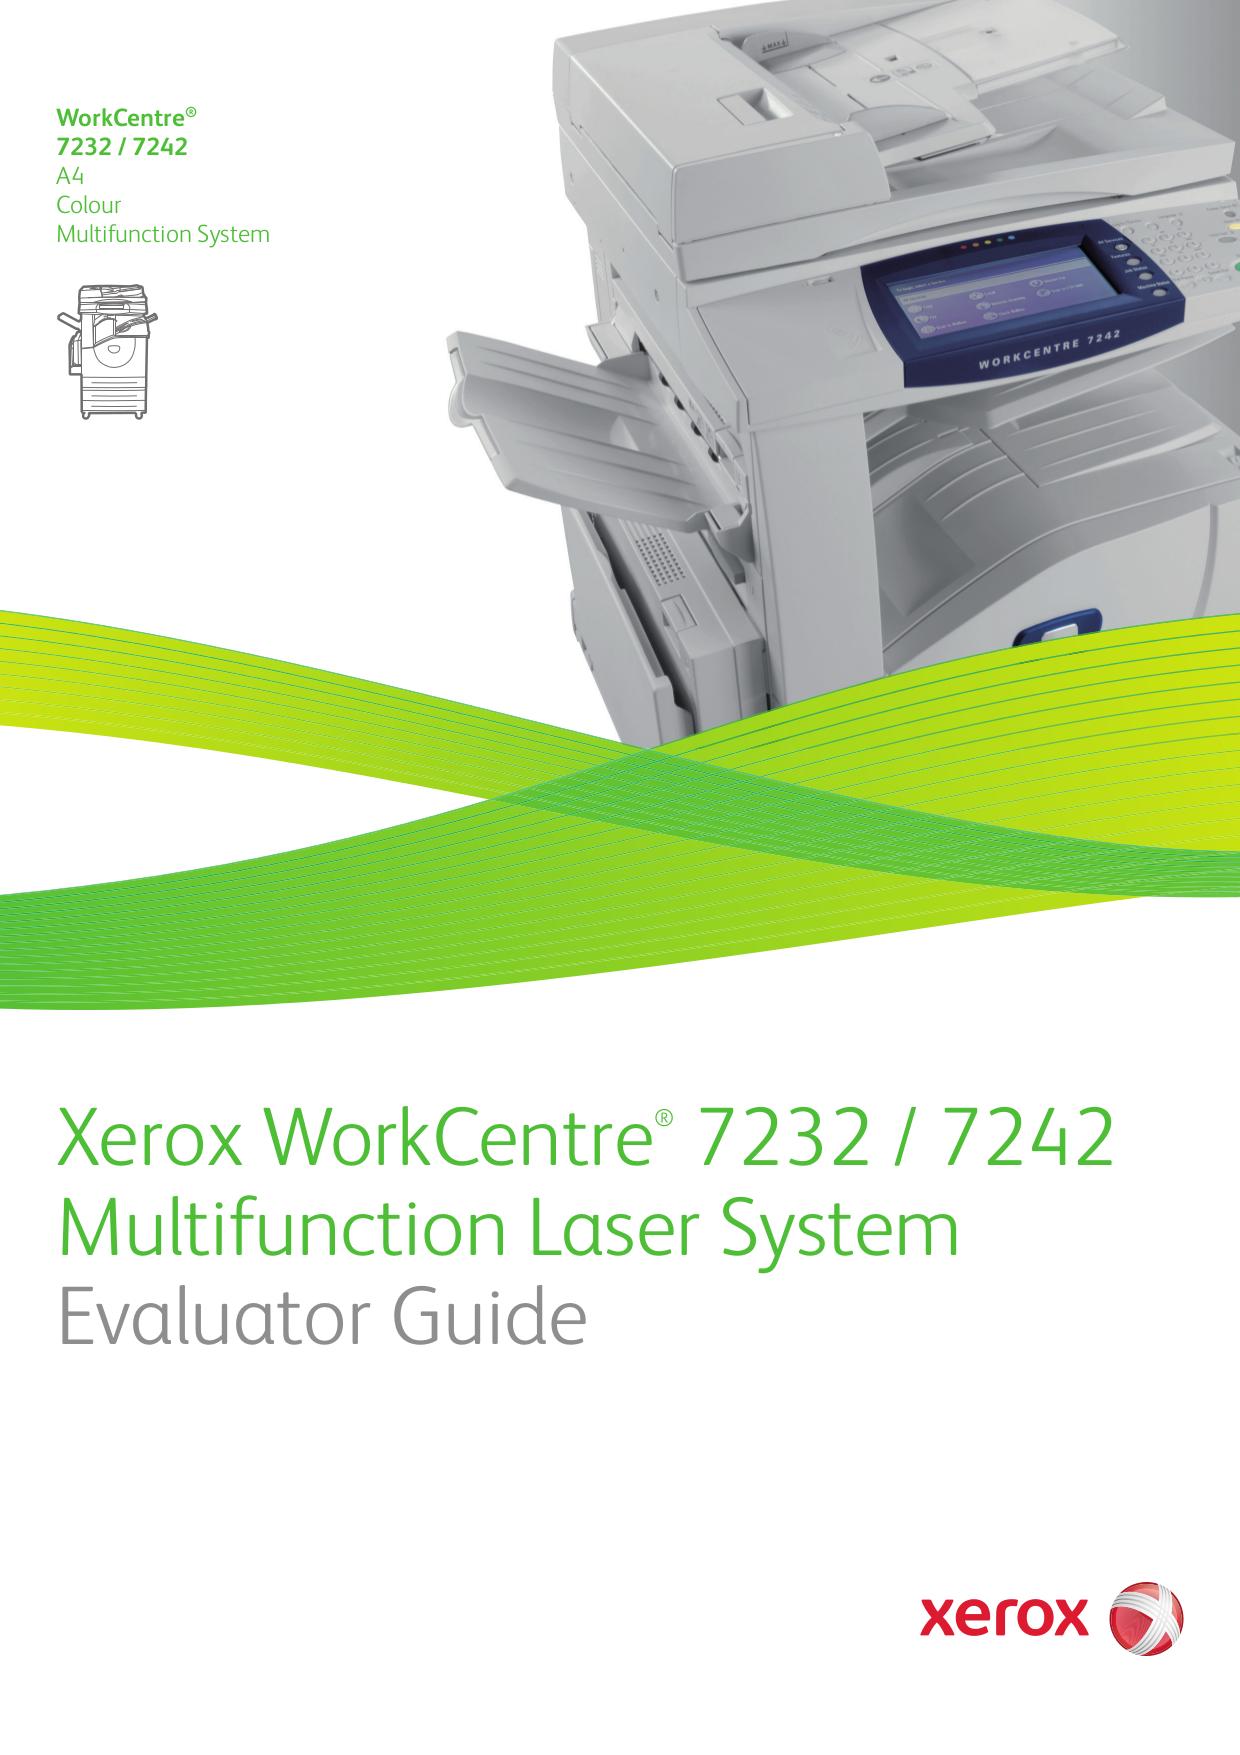 xerox workcentre 7345 service manual pdf